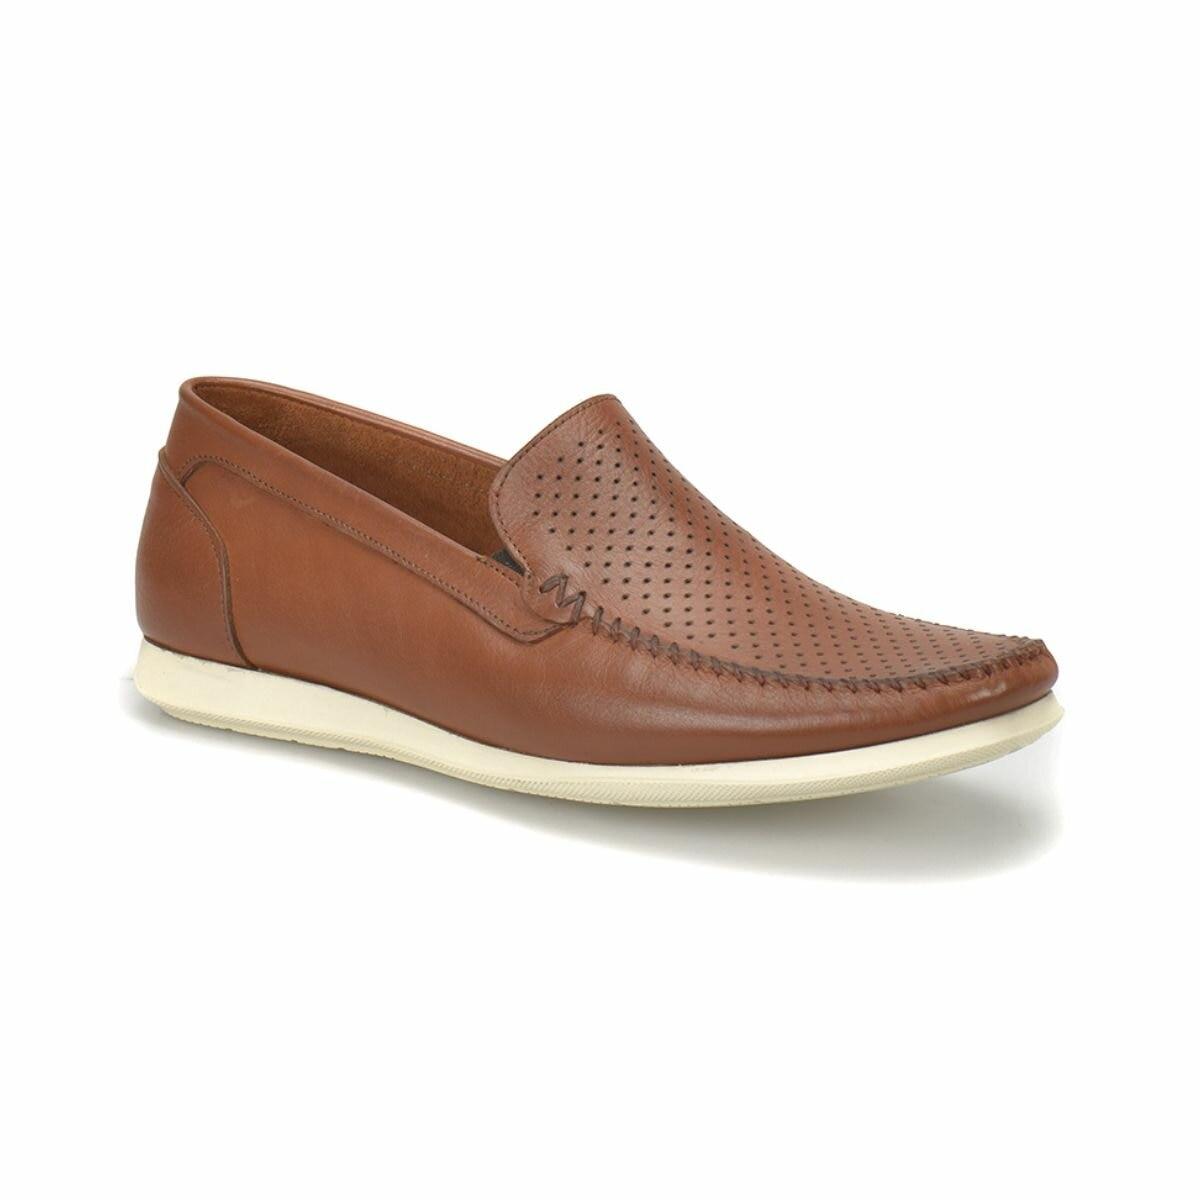 FLO 278-1 M 6674 Tan Men Modern Shoes Flogart